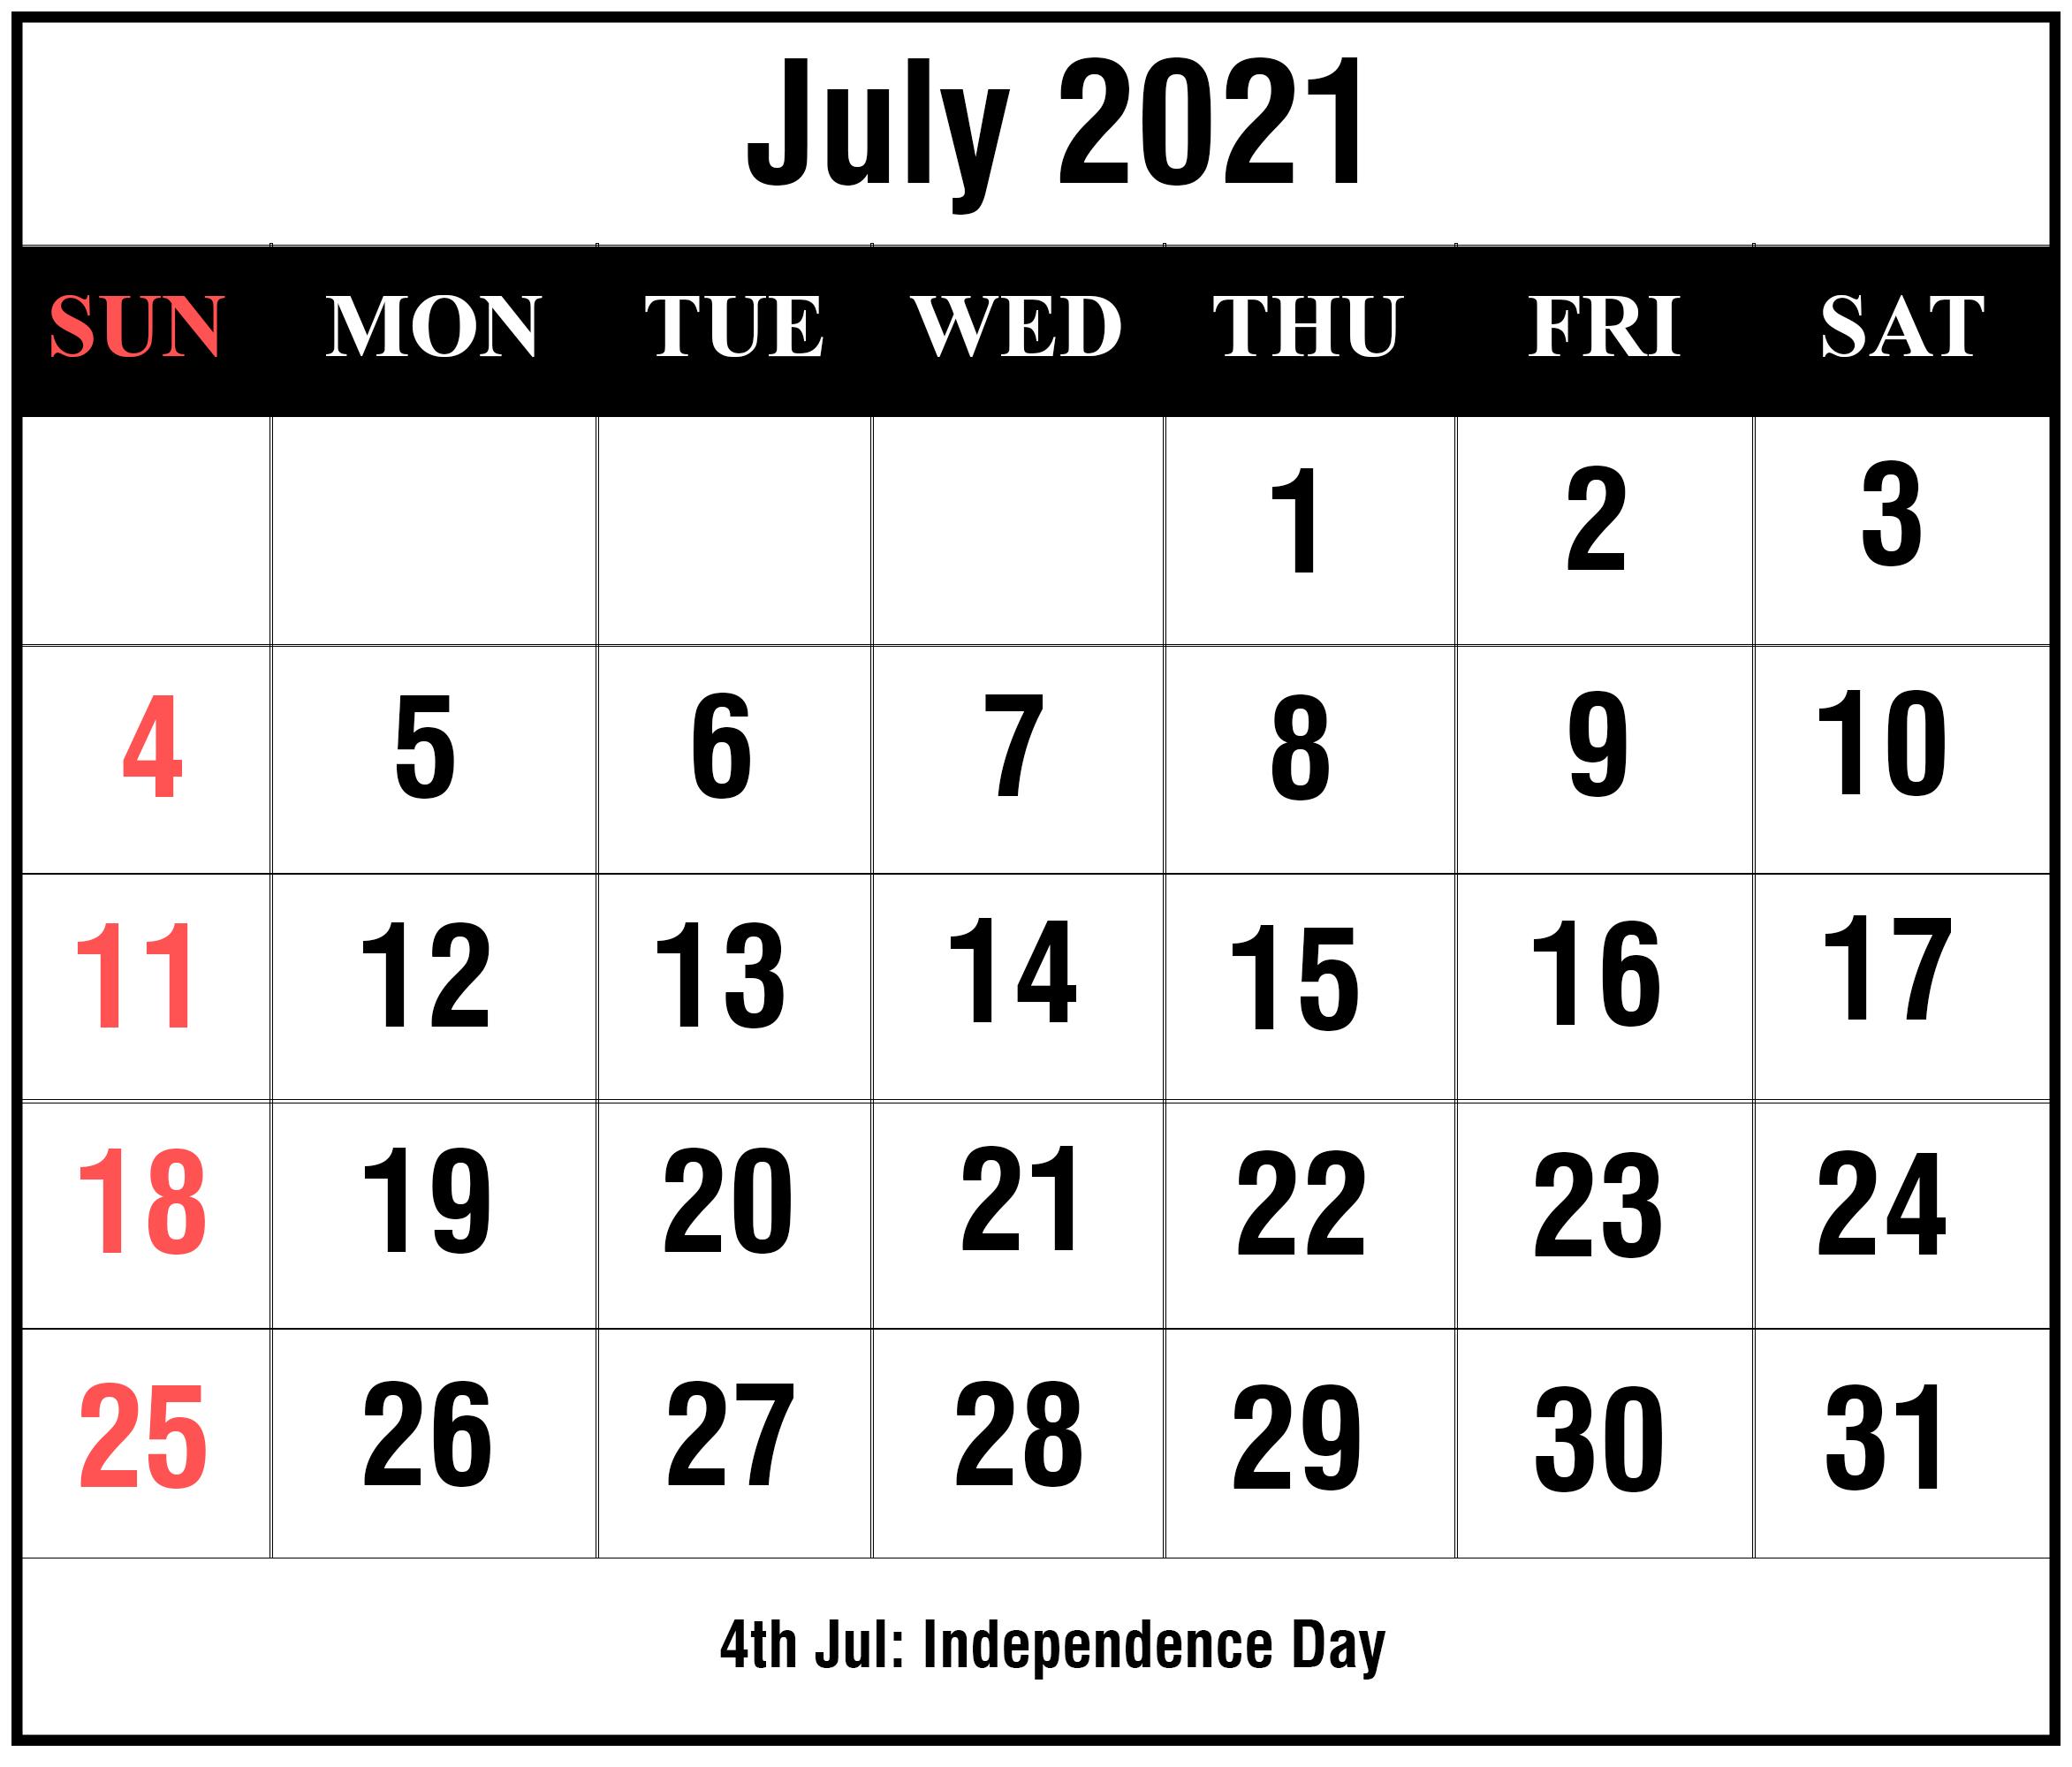 Free Blank July 2021 Printable Calendar Template In Pdf